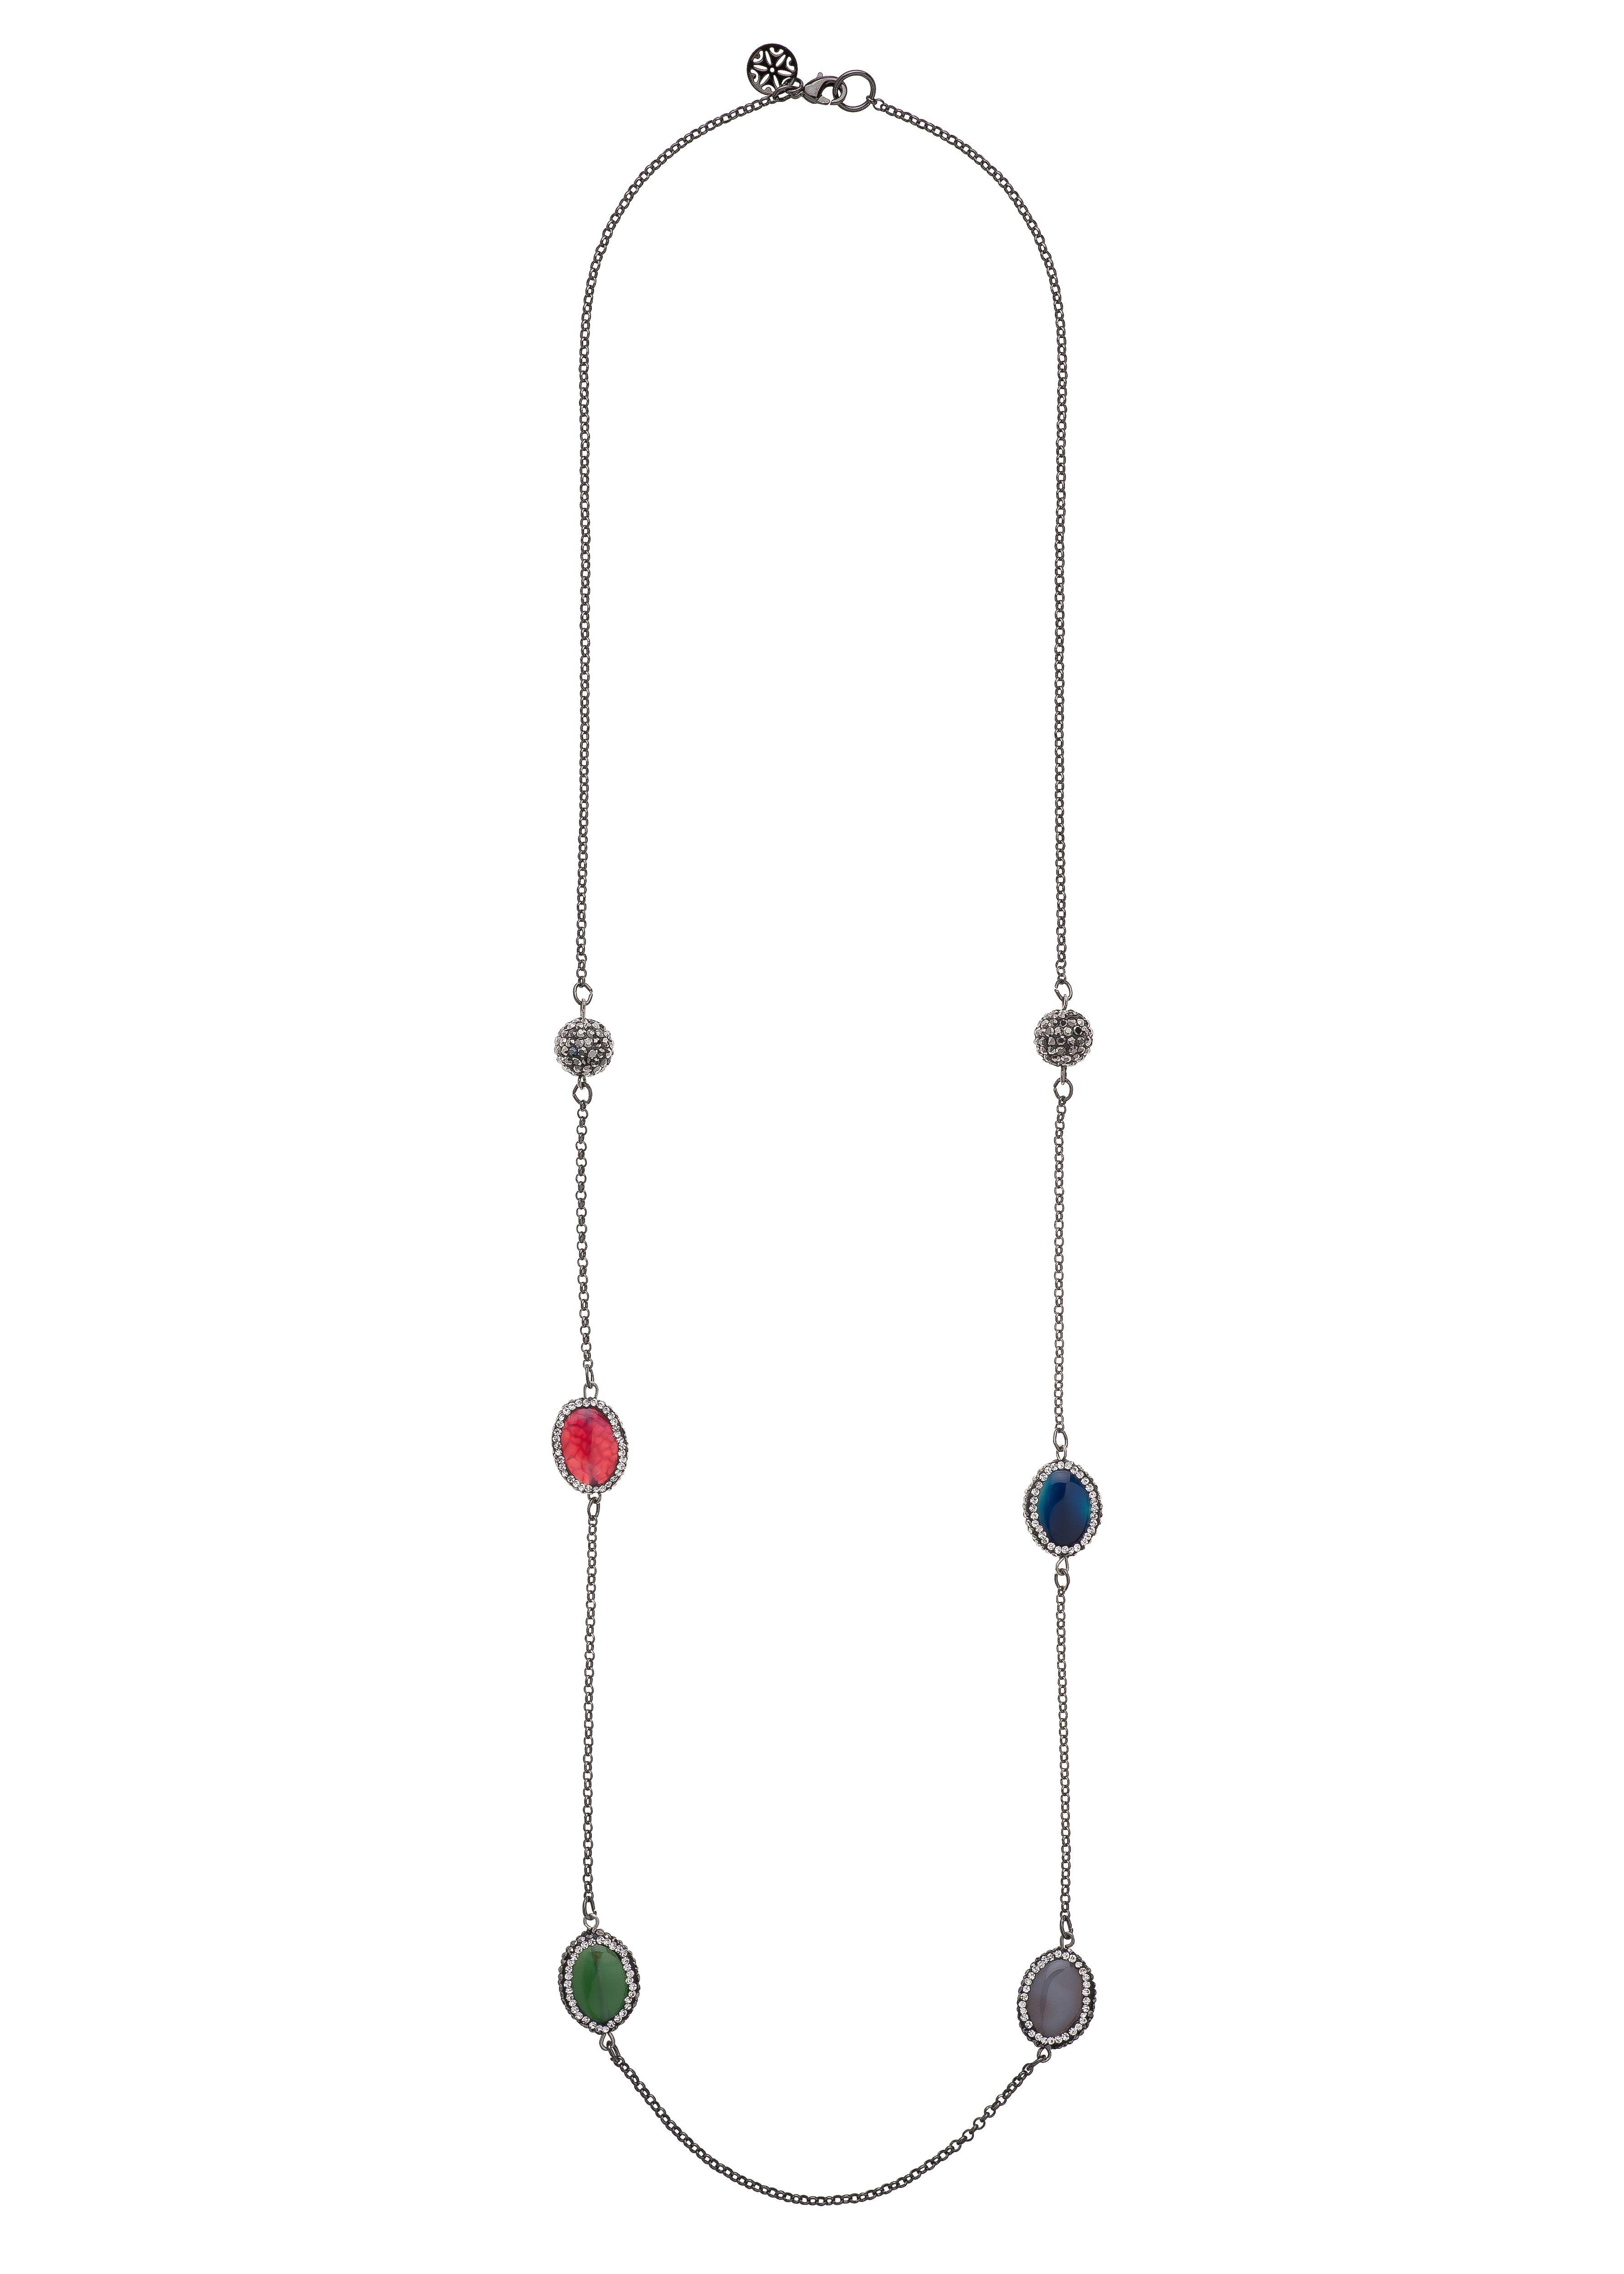 d384fd122c19 Collar largo 118515L Collar de 97cm de largo